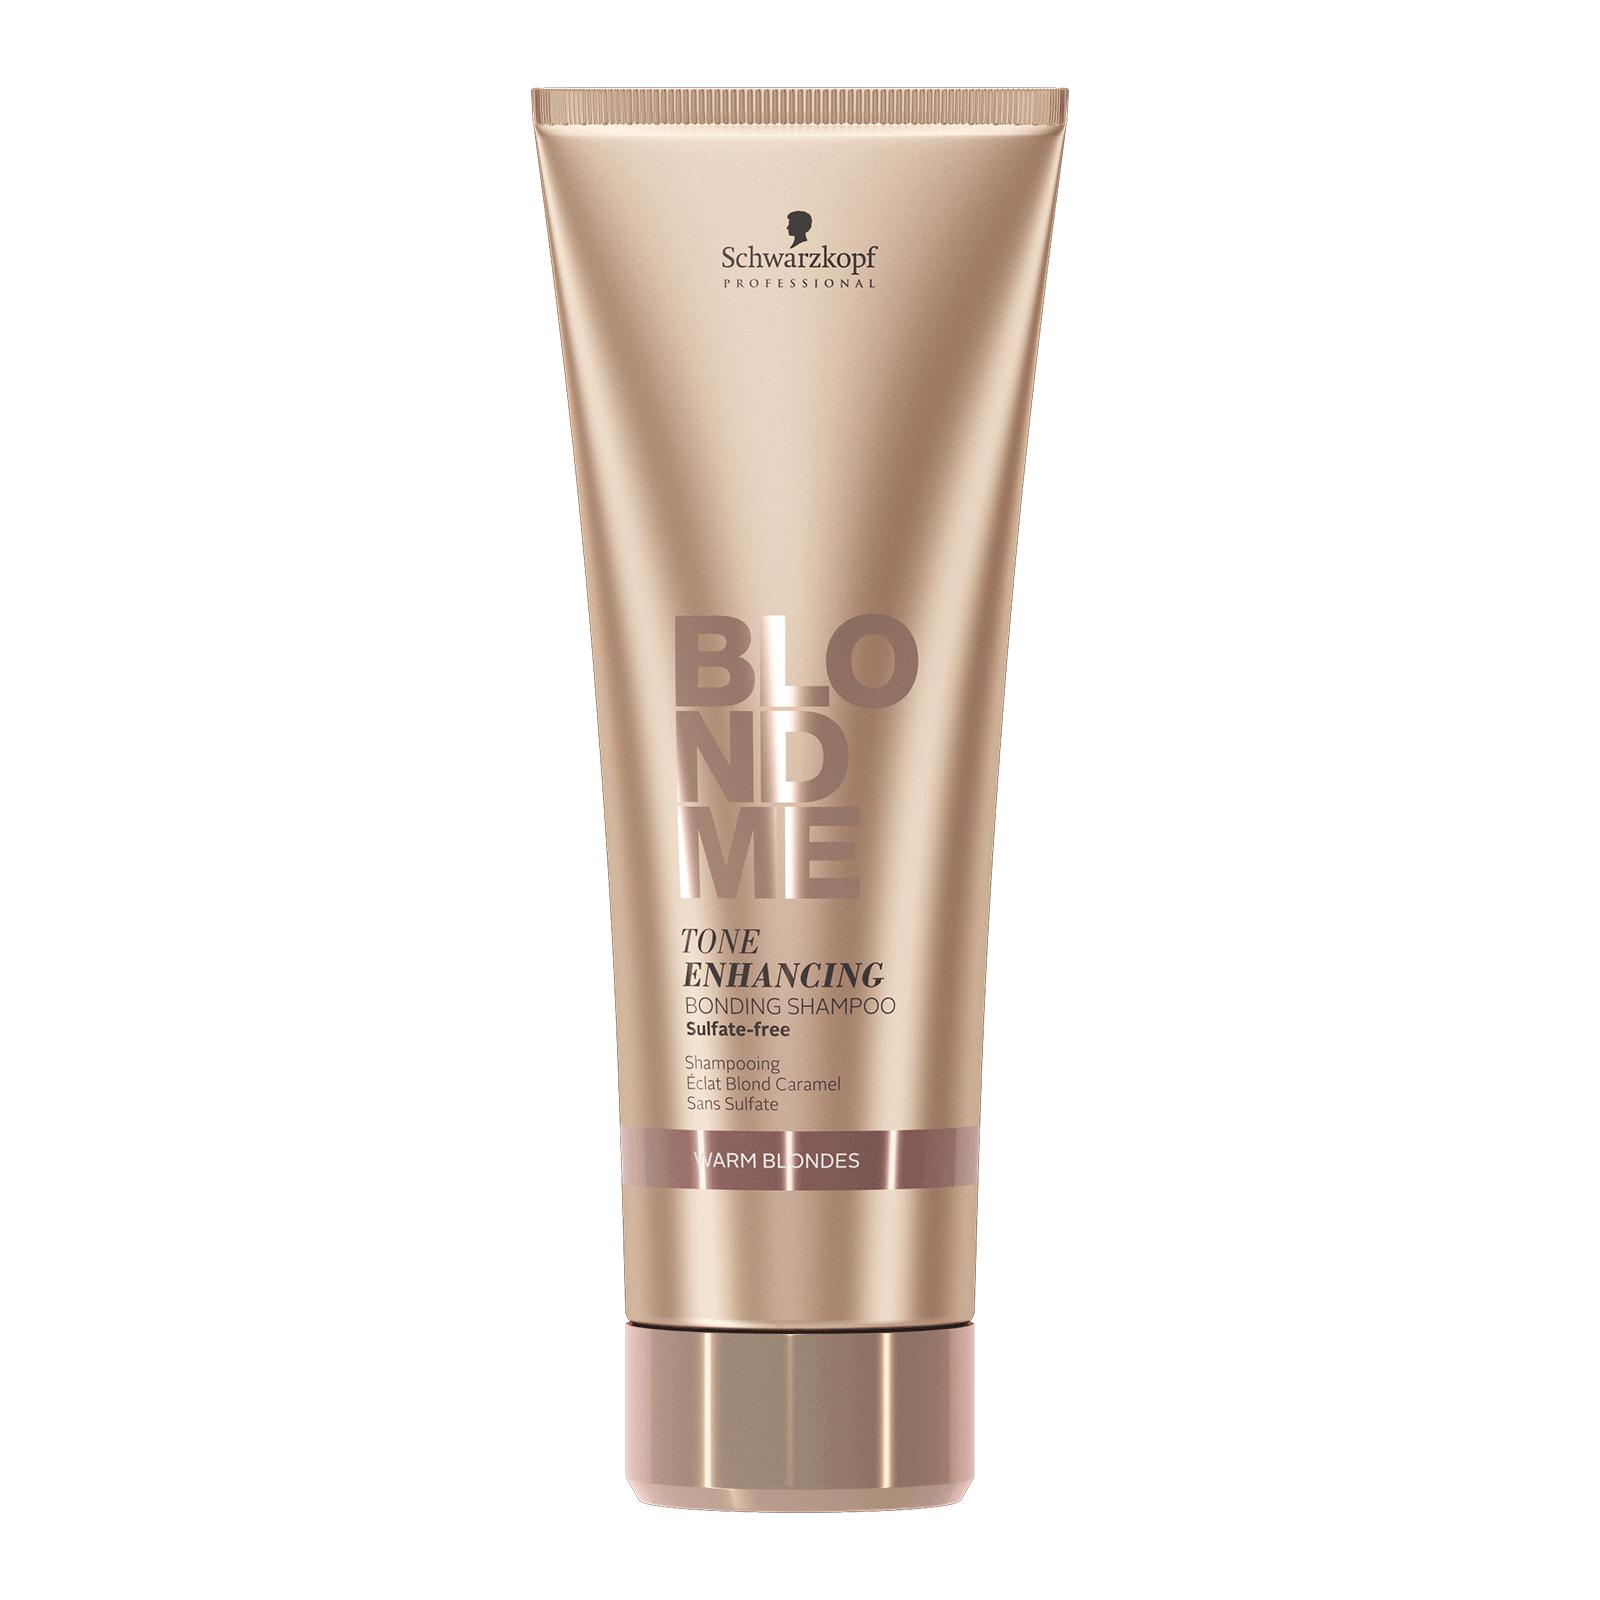 Schwarzkopf BlondMe - Tone Enhancing Bonding Shampoo for Warm Blondes 8.45oz